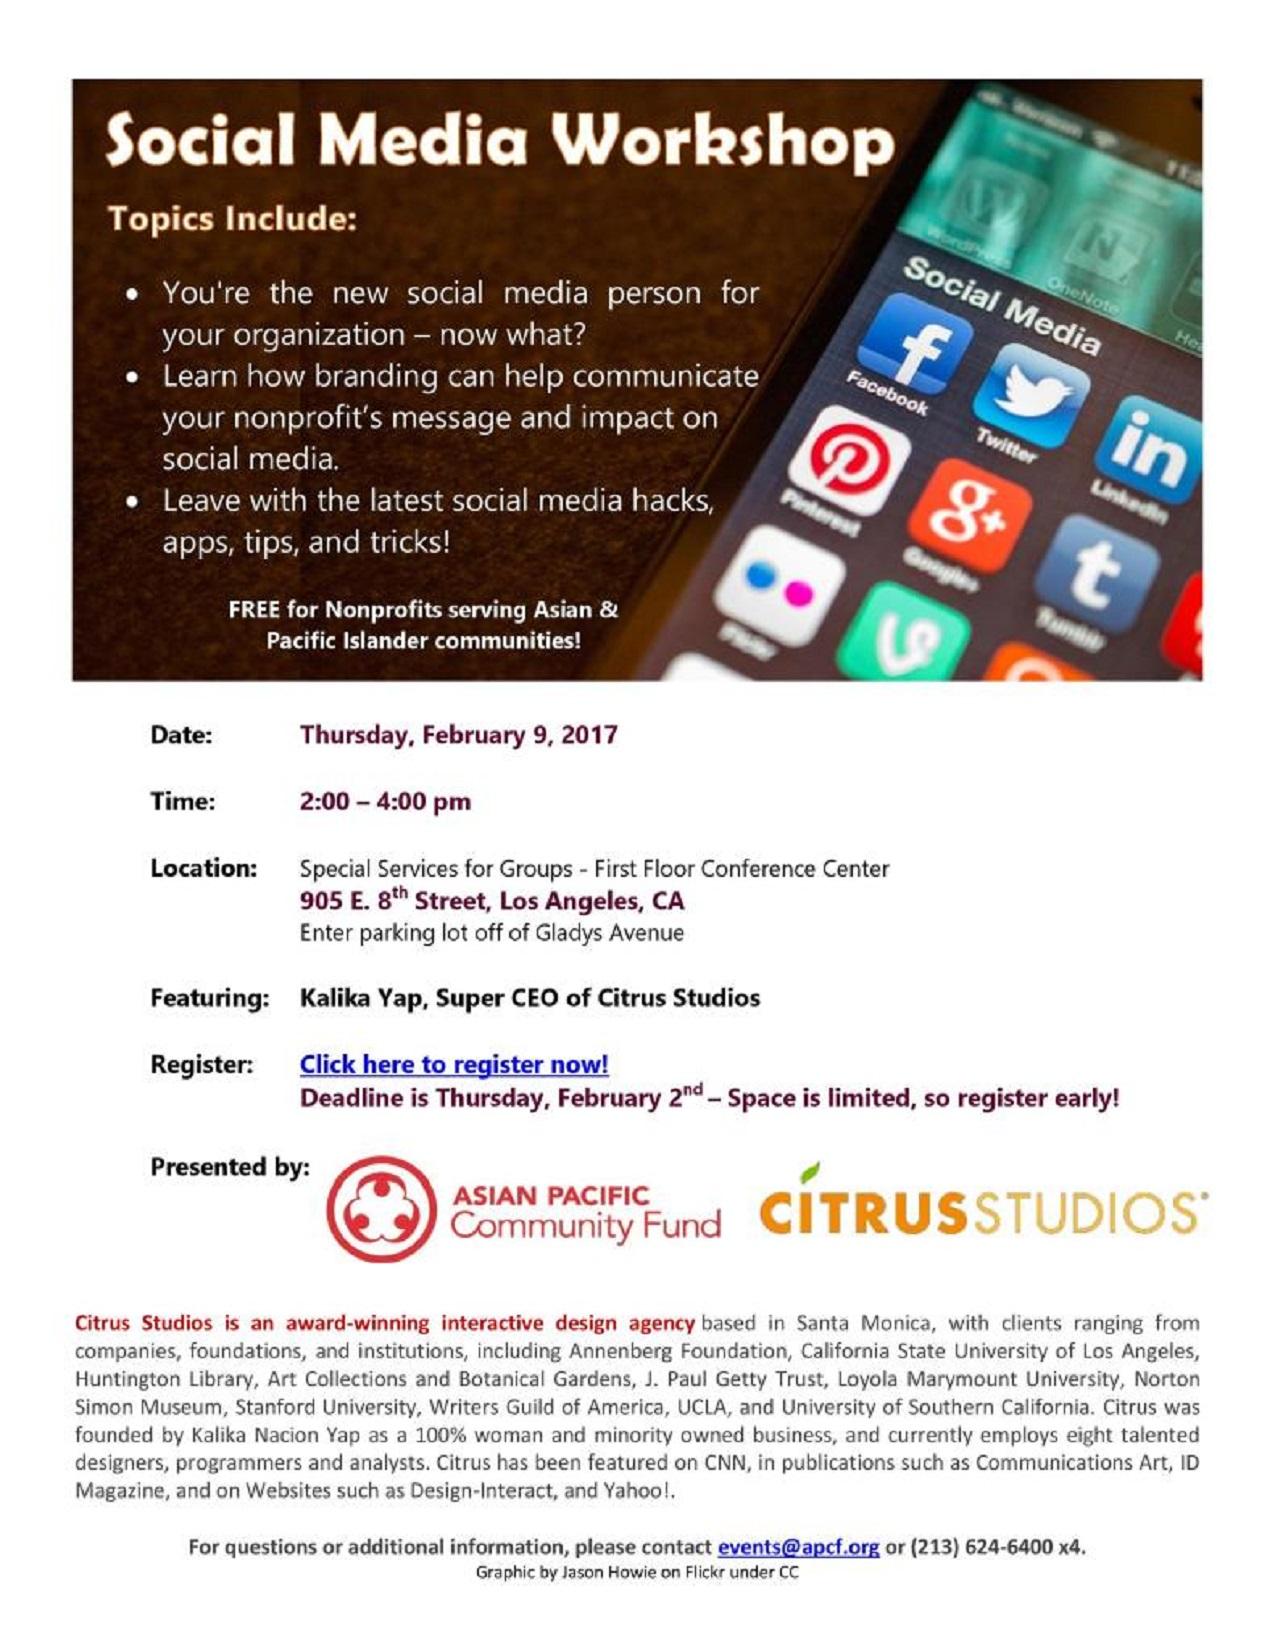 2017-Social-Media-Workshop-Flier.jpg